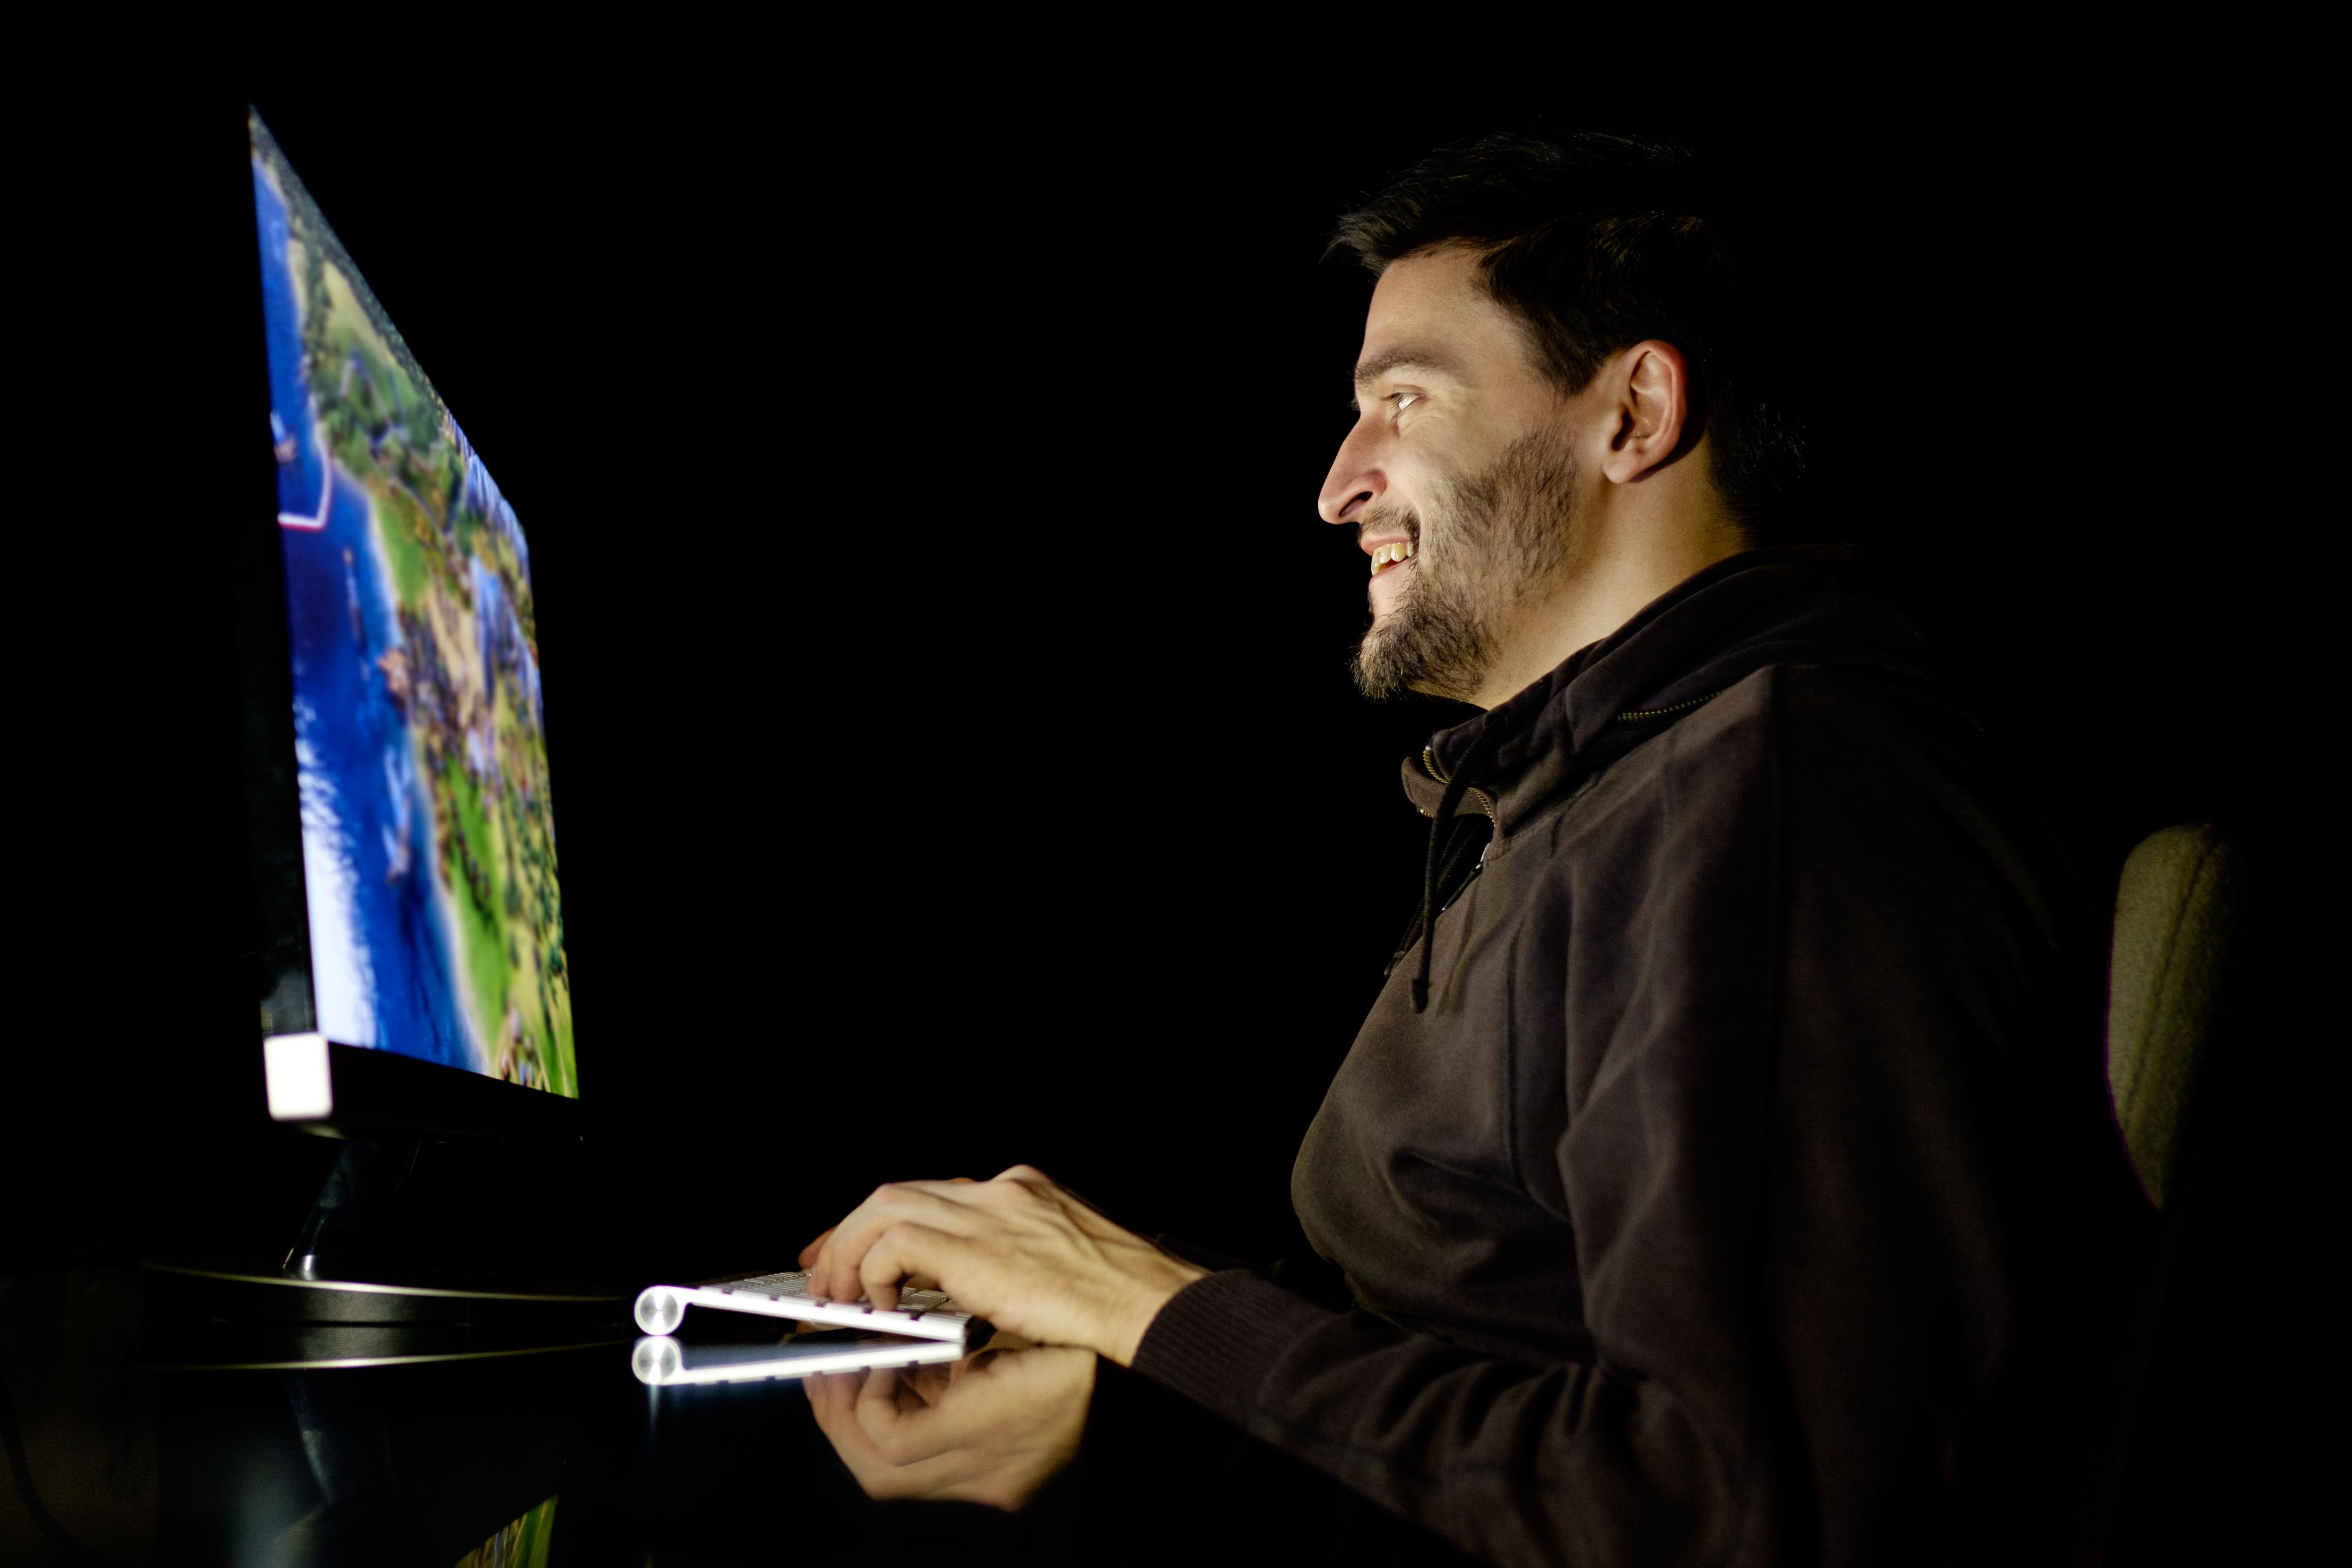 Man playing computer games.